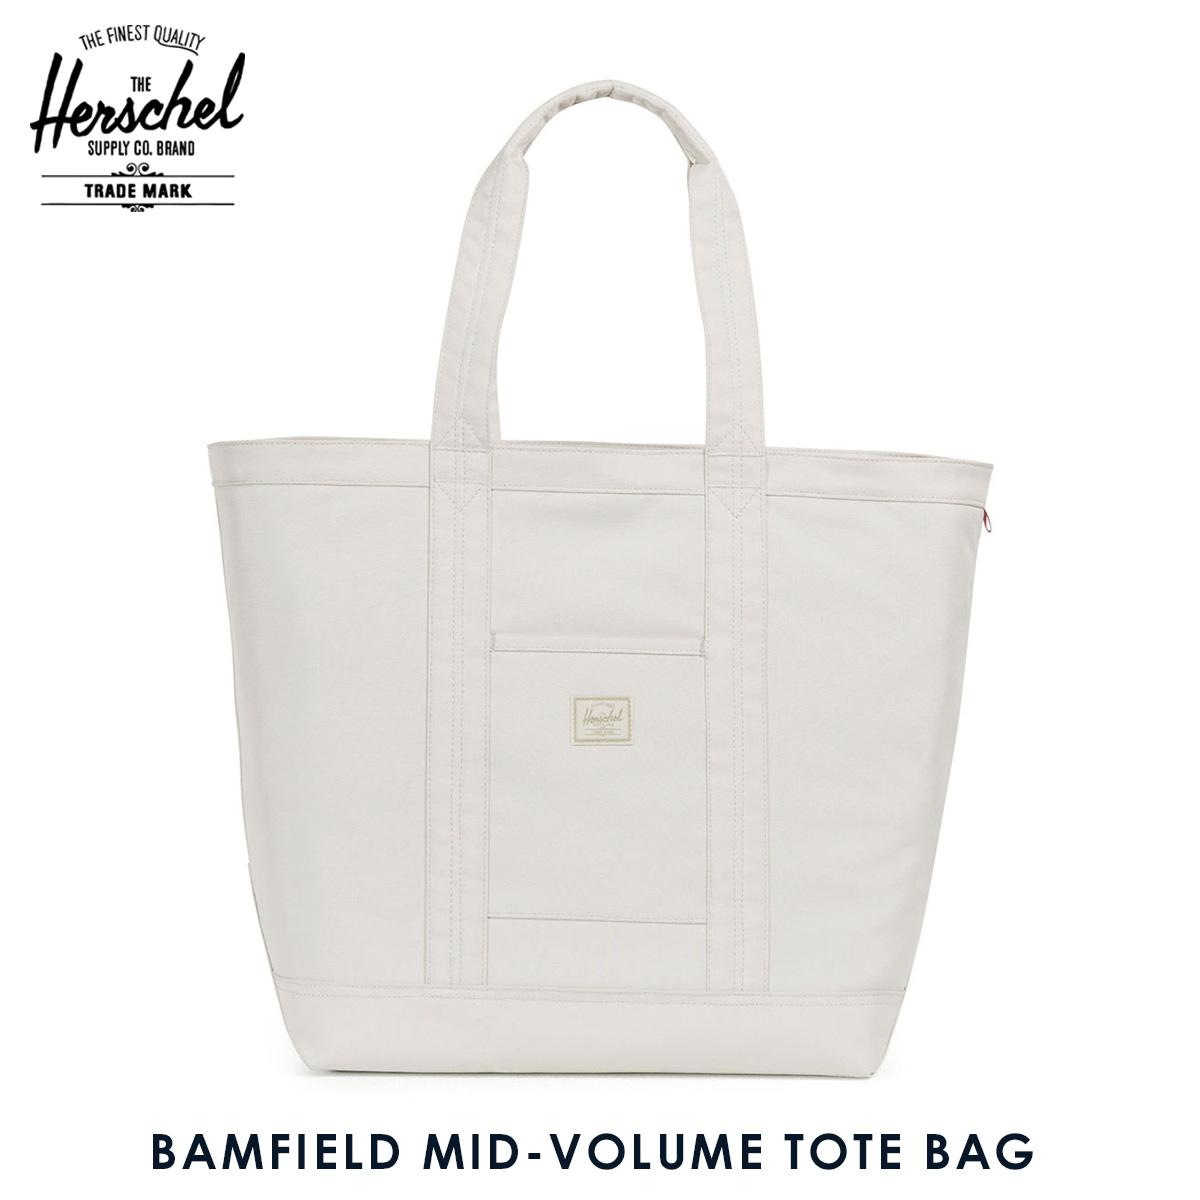 924f42ed7a45 Hershel supply Herschel Supply regular store bag tote bag BAMFIELD MID-VOLUME  TOTE BAG FOUNDATION 10318-01815-OS SILVER BIRCH